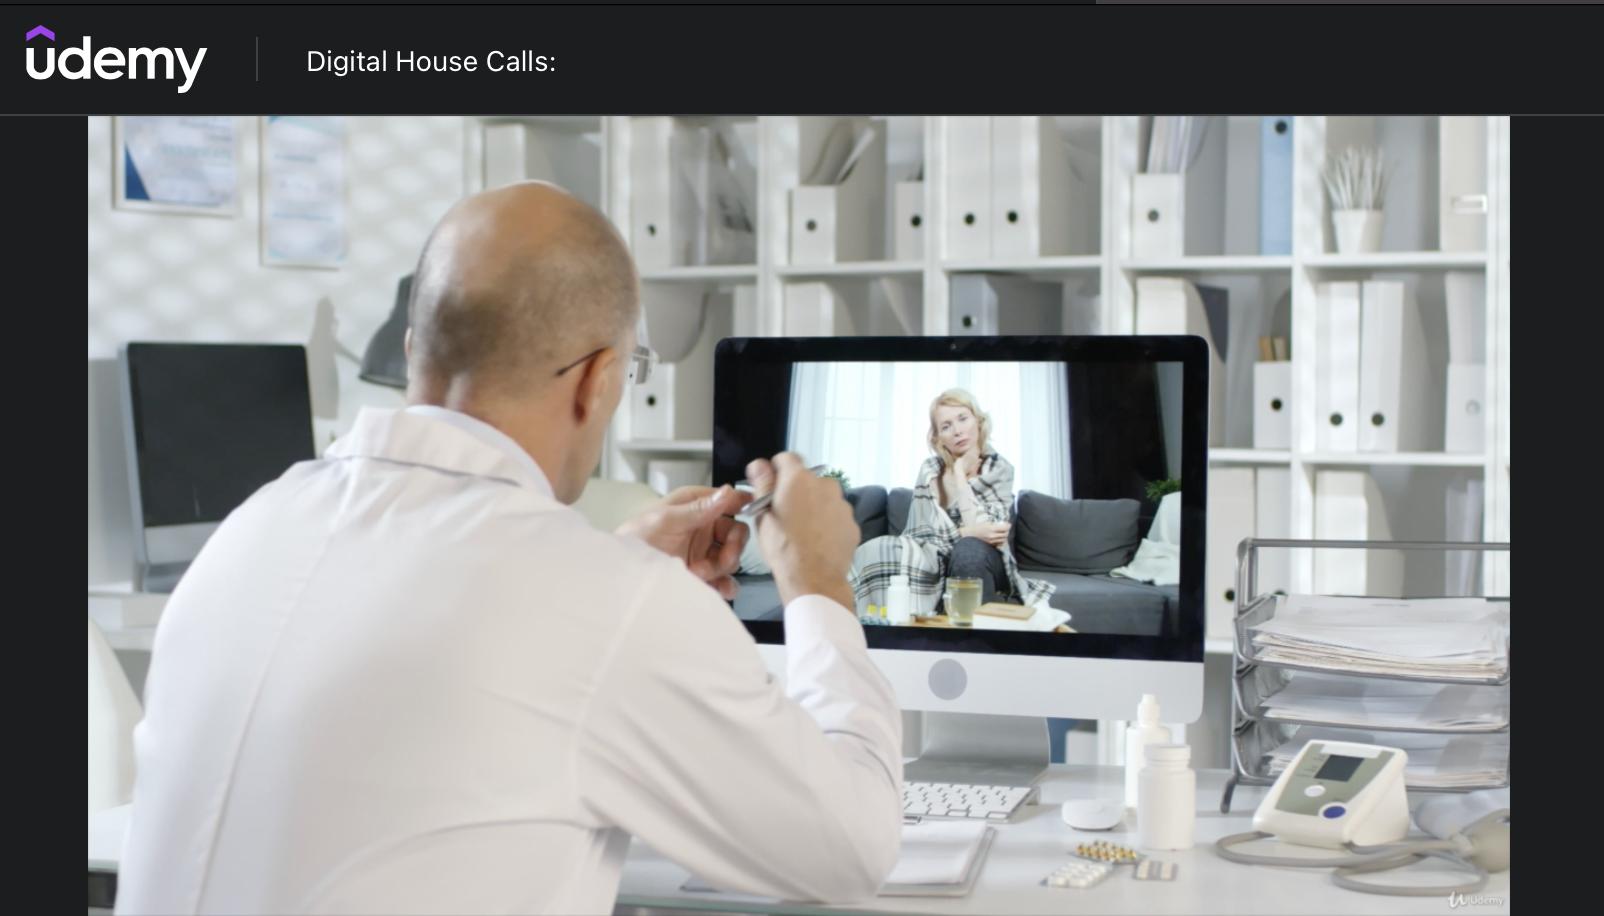 digital house calls image